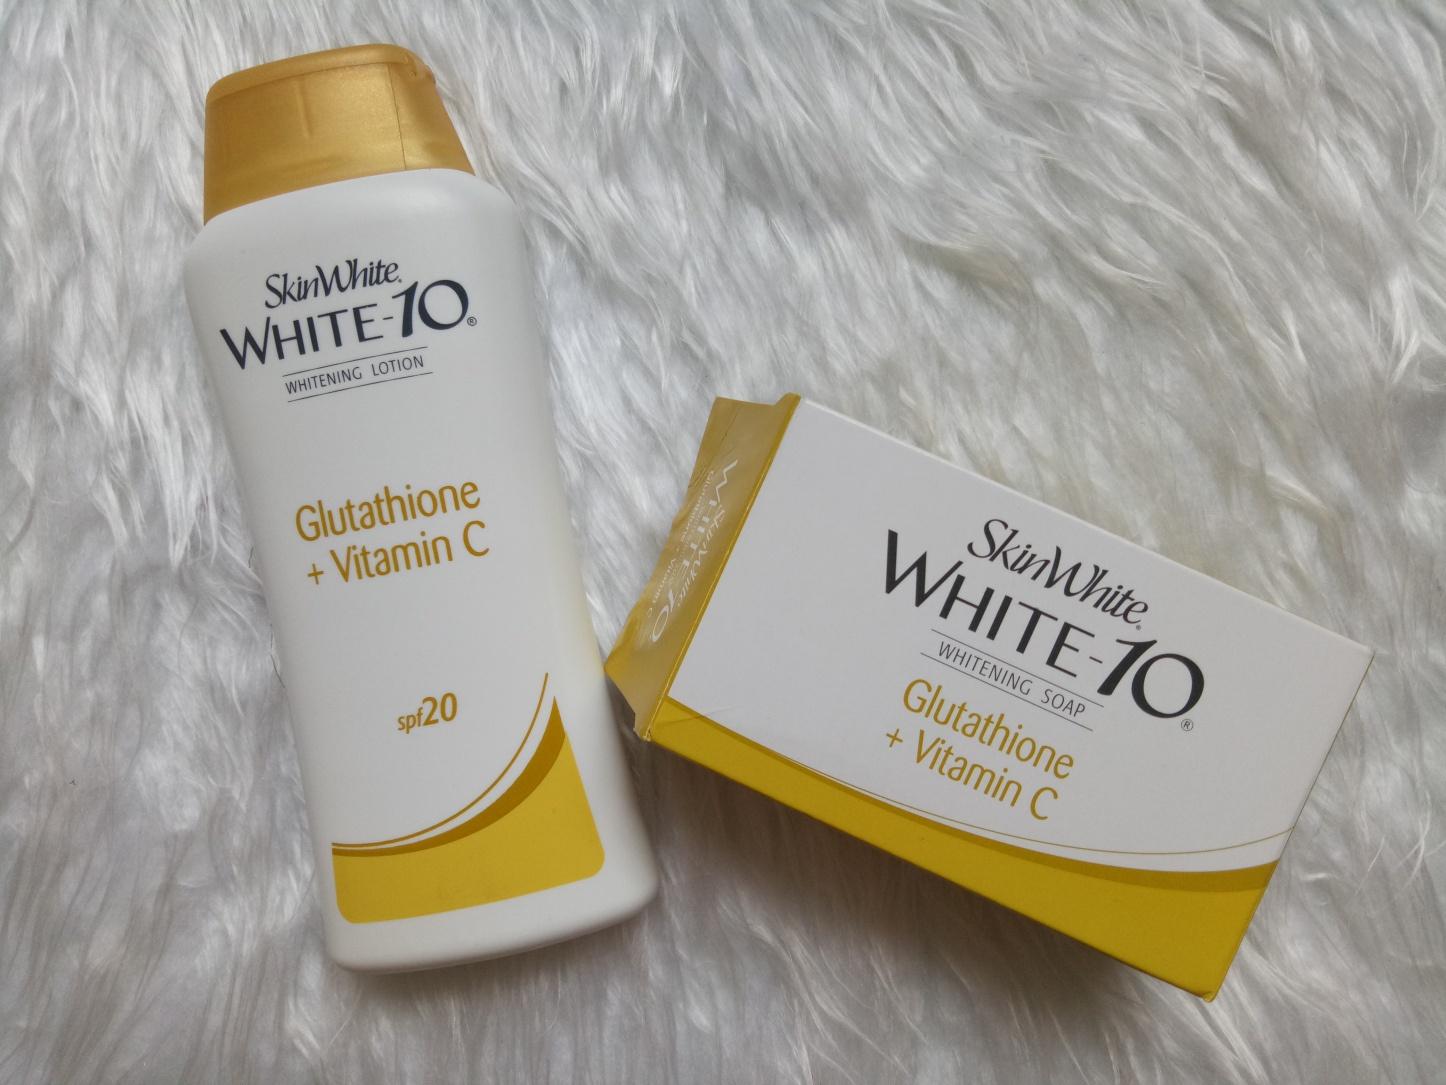 SkinWhite White-10 Whitening Soap